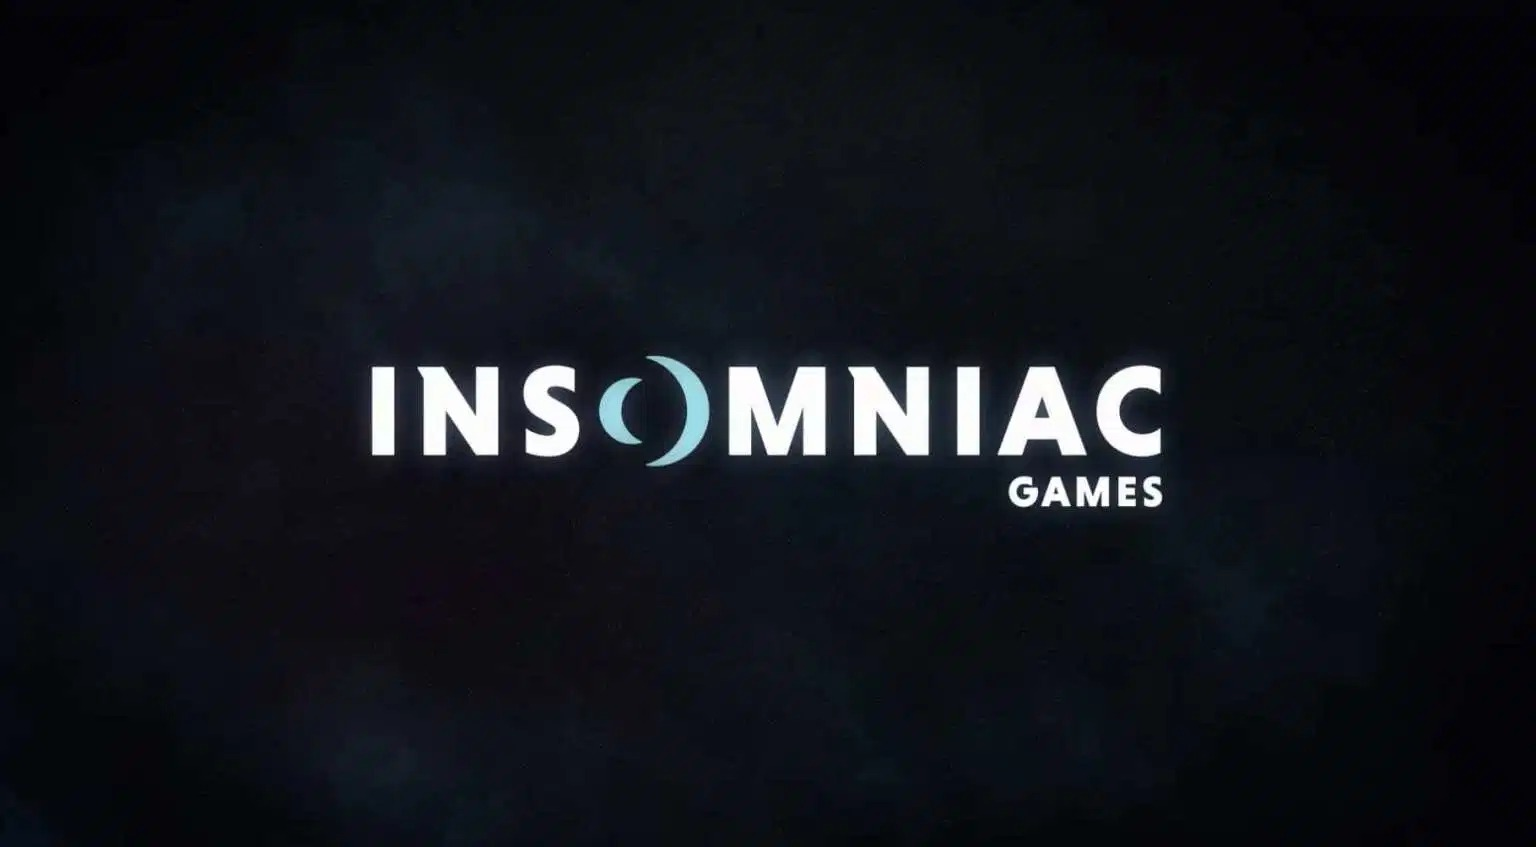 Insomniac工作室回应性骚扰传闻